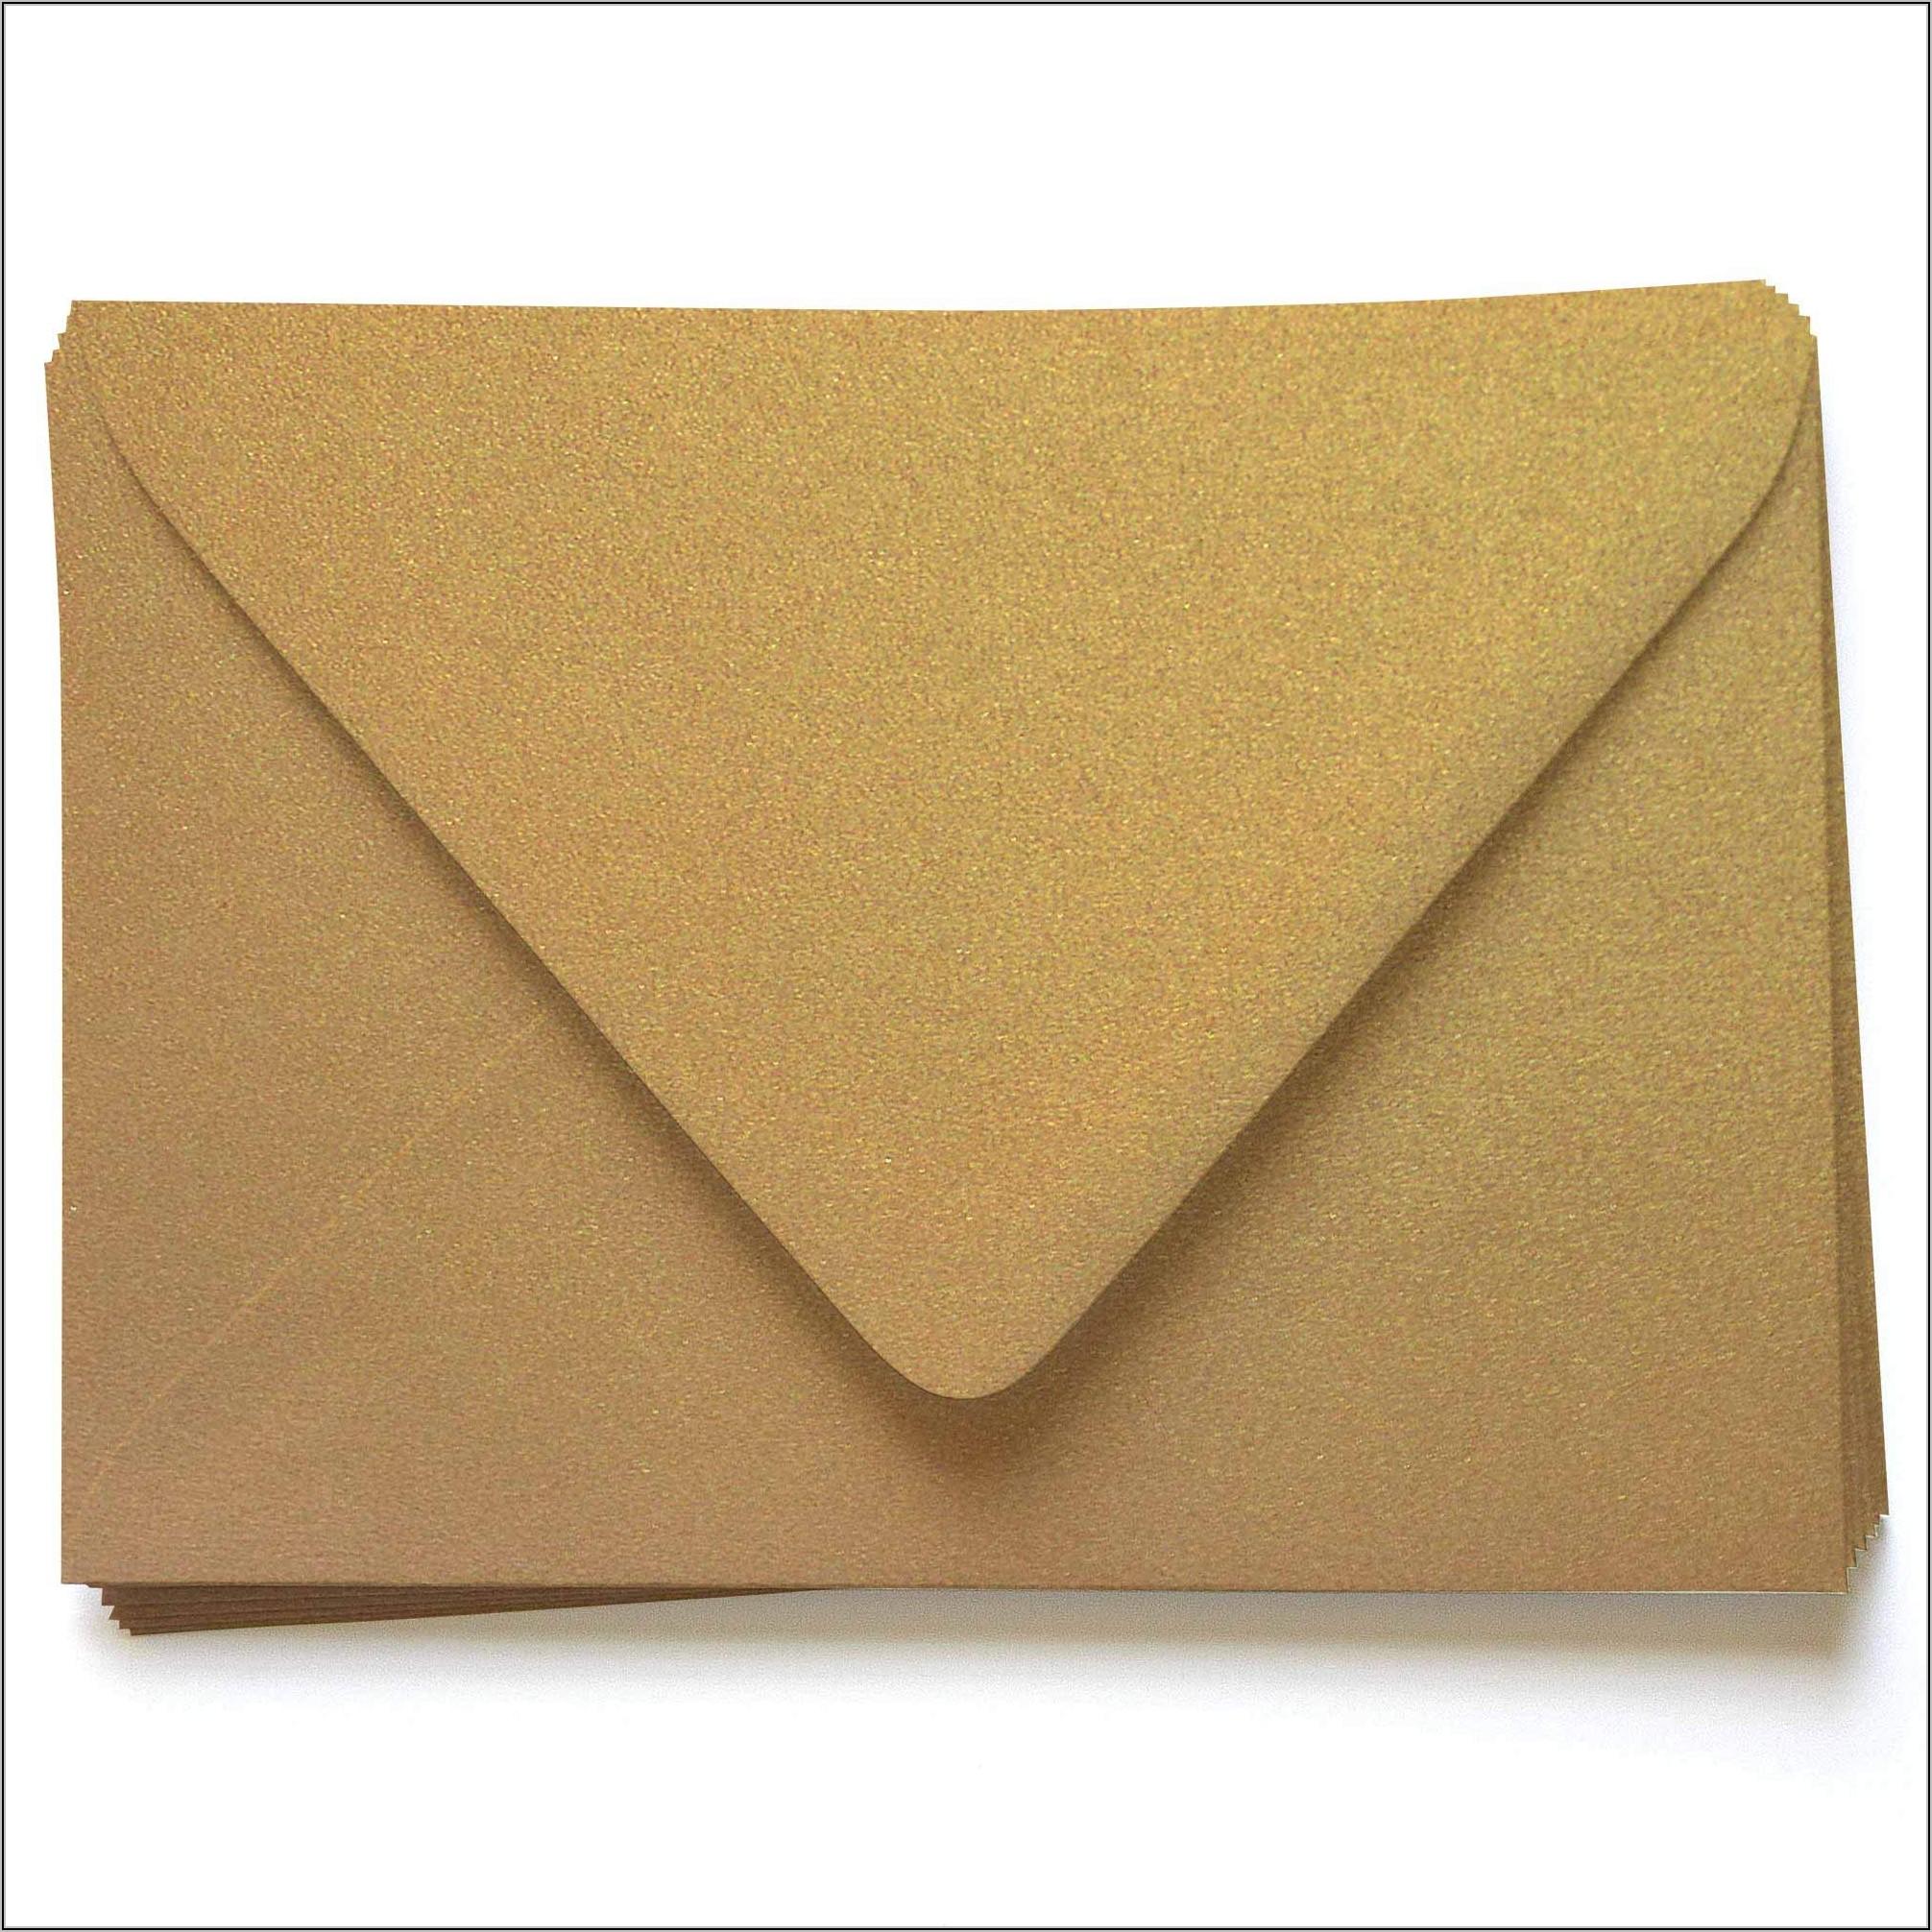 5 14 X 7 14 Envelopes